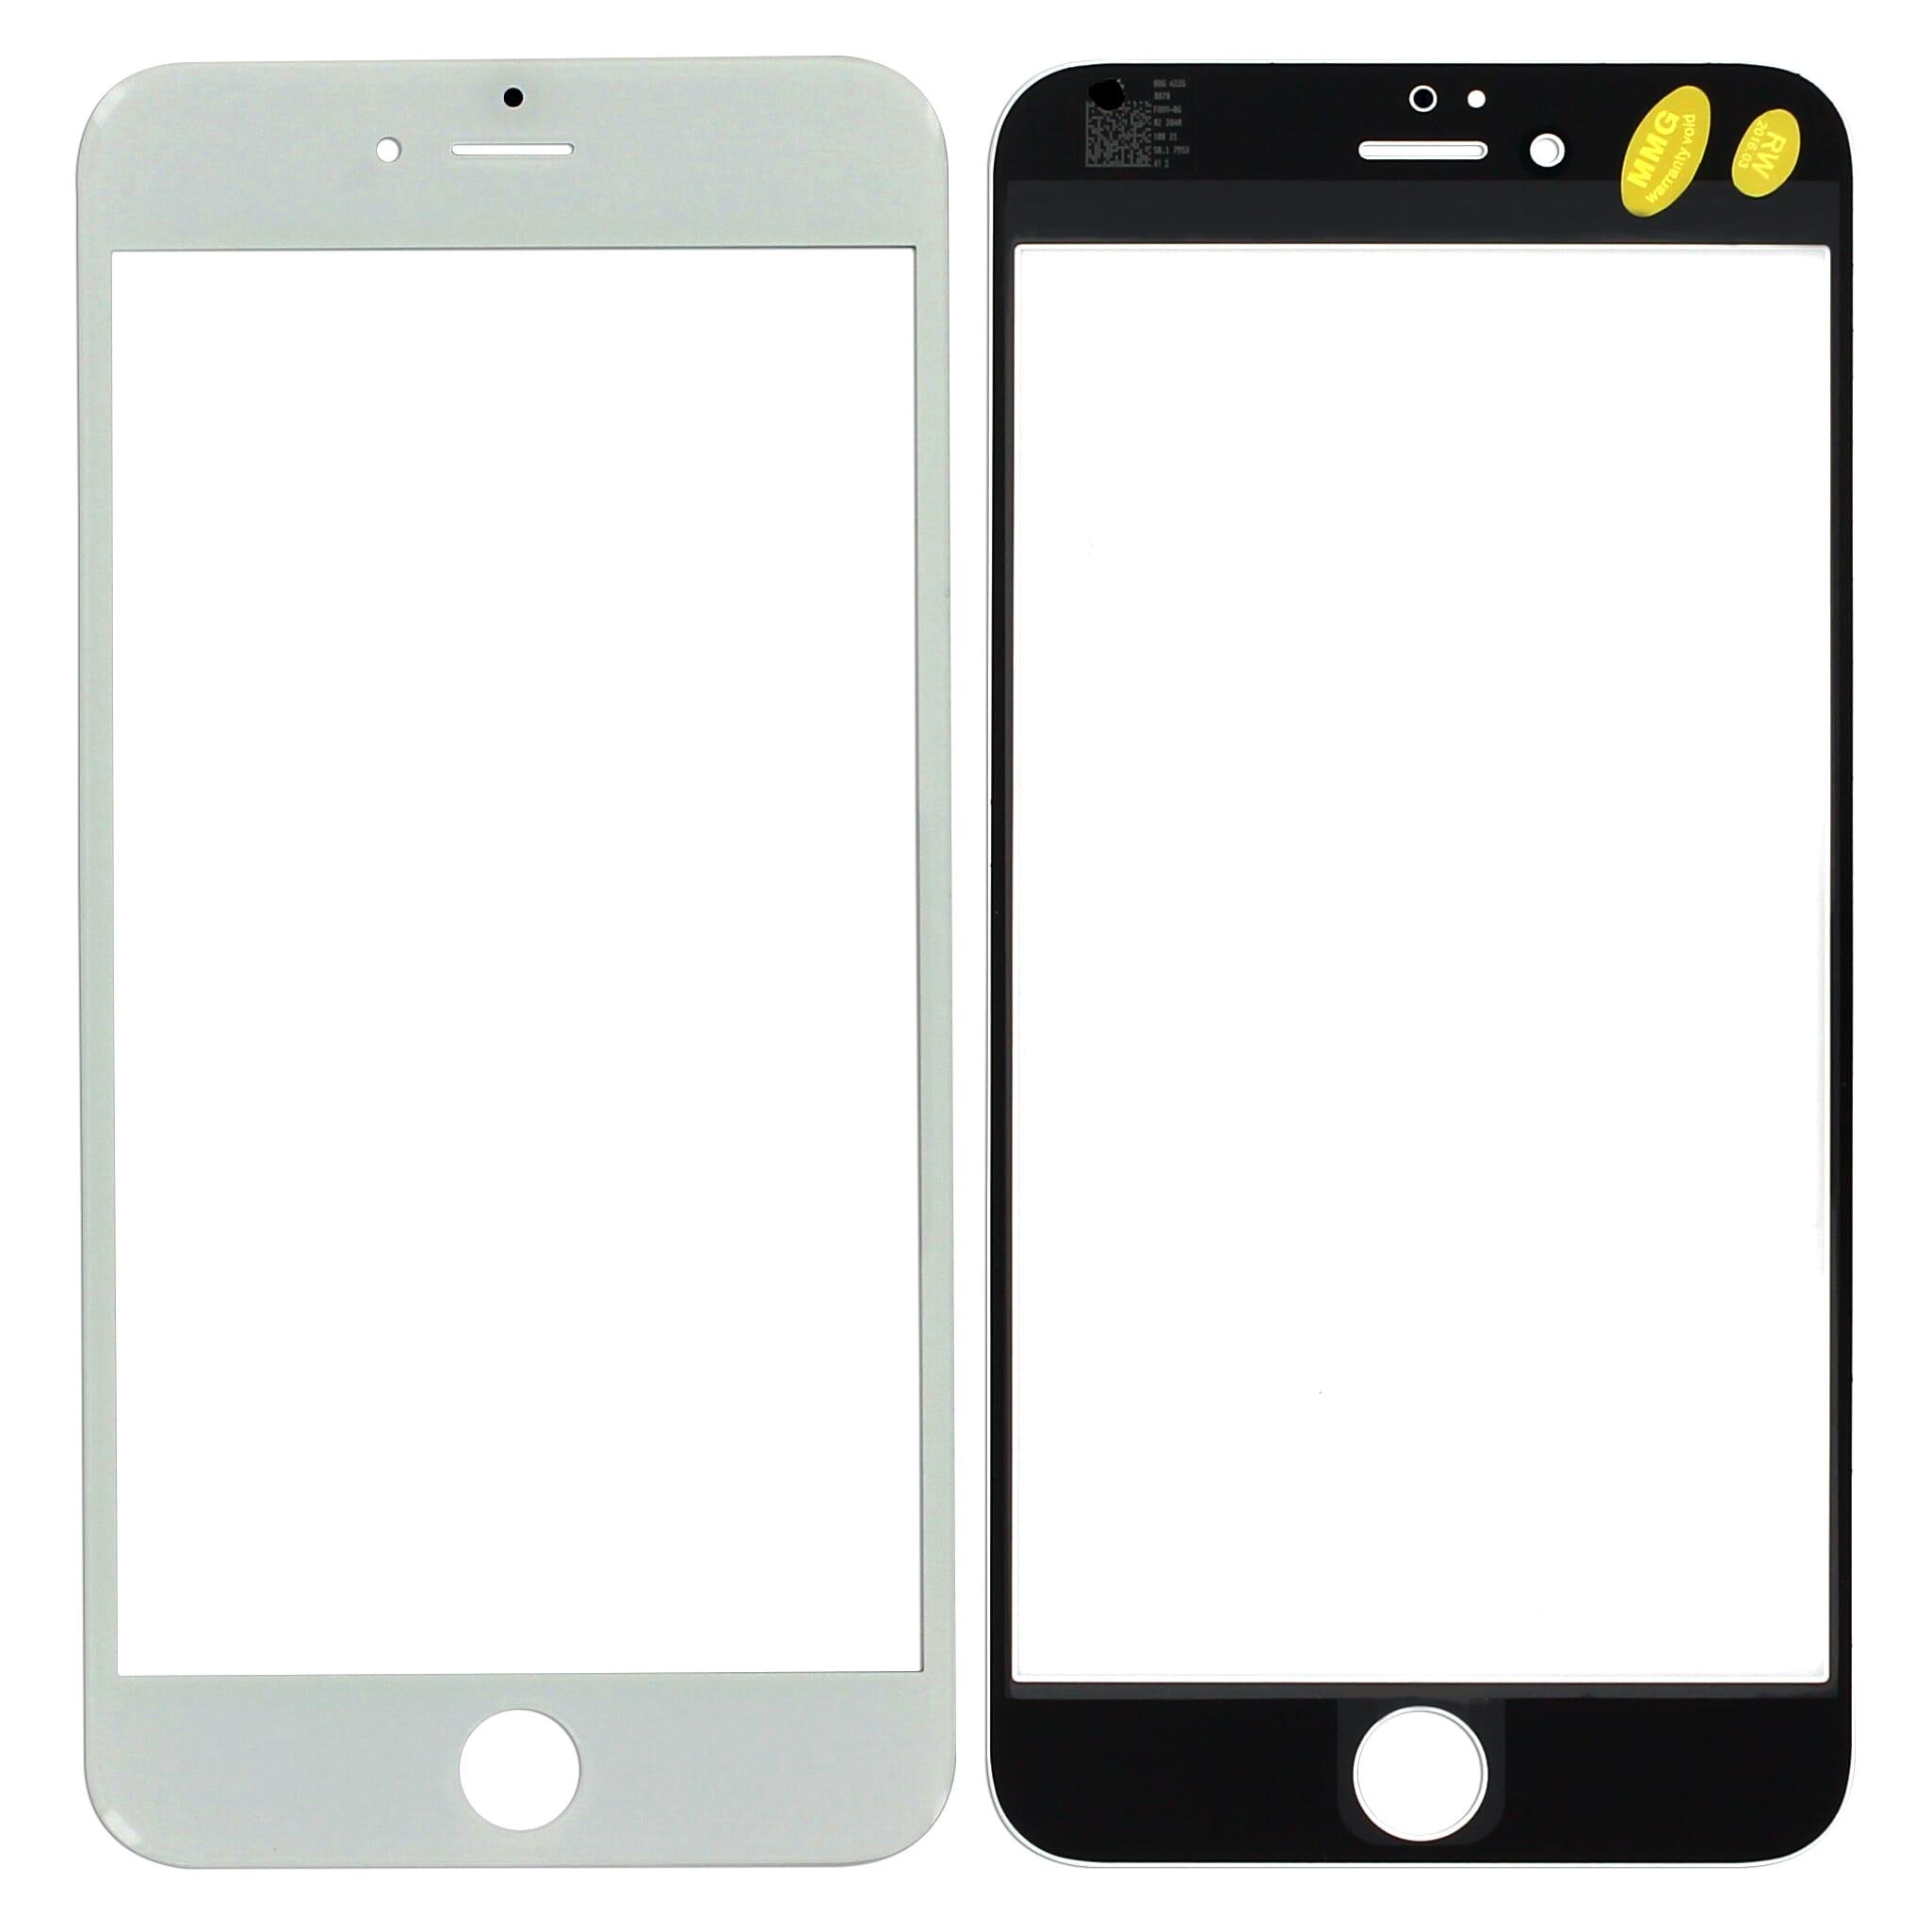 iphone 6 plus glass lens weiss voor apple iphone 6 plus. Black Bedroom Furniture Sets. Home Design Ideas